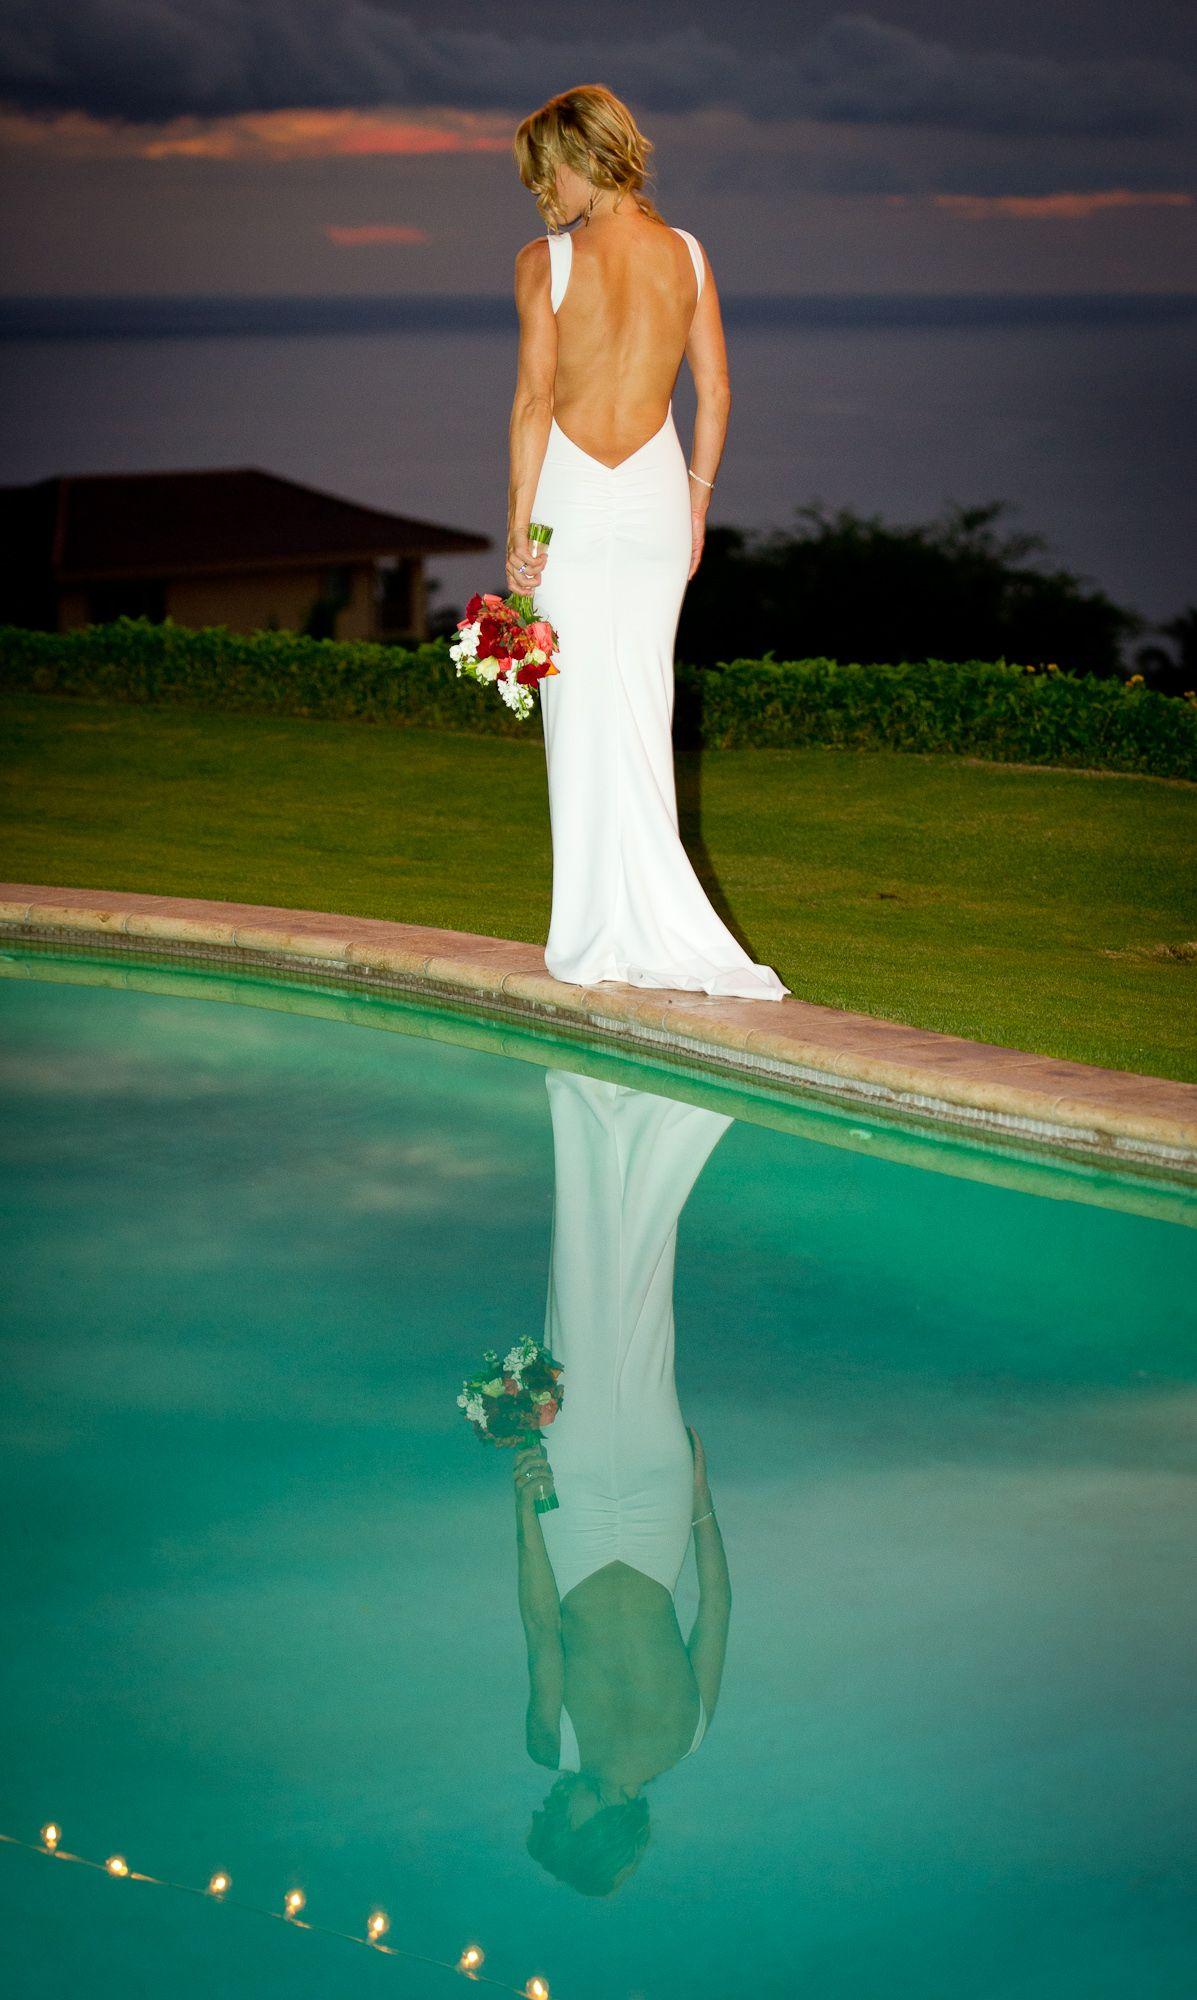 Simple backless wedding dress!